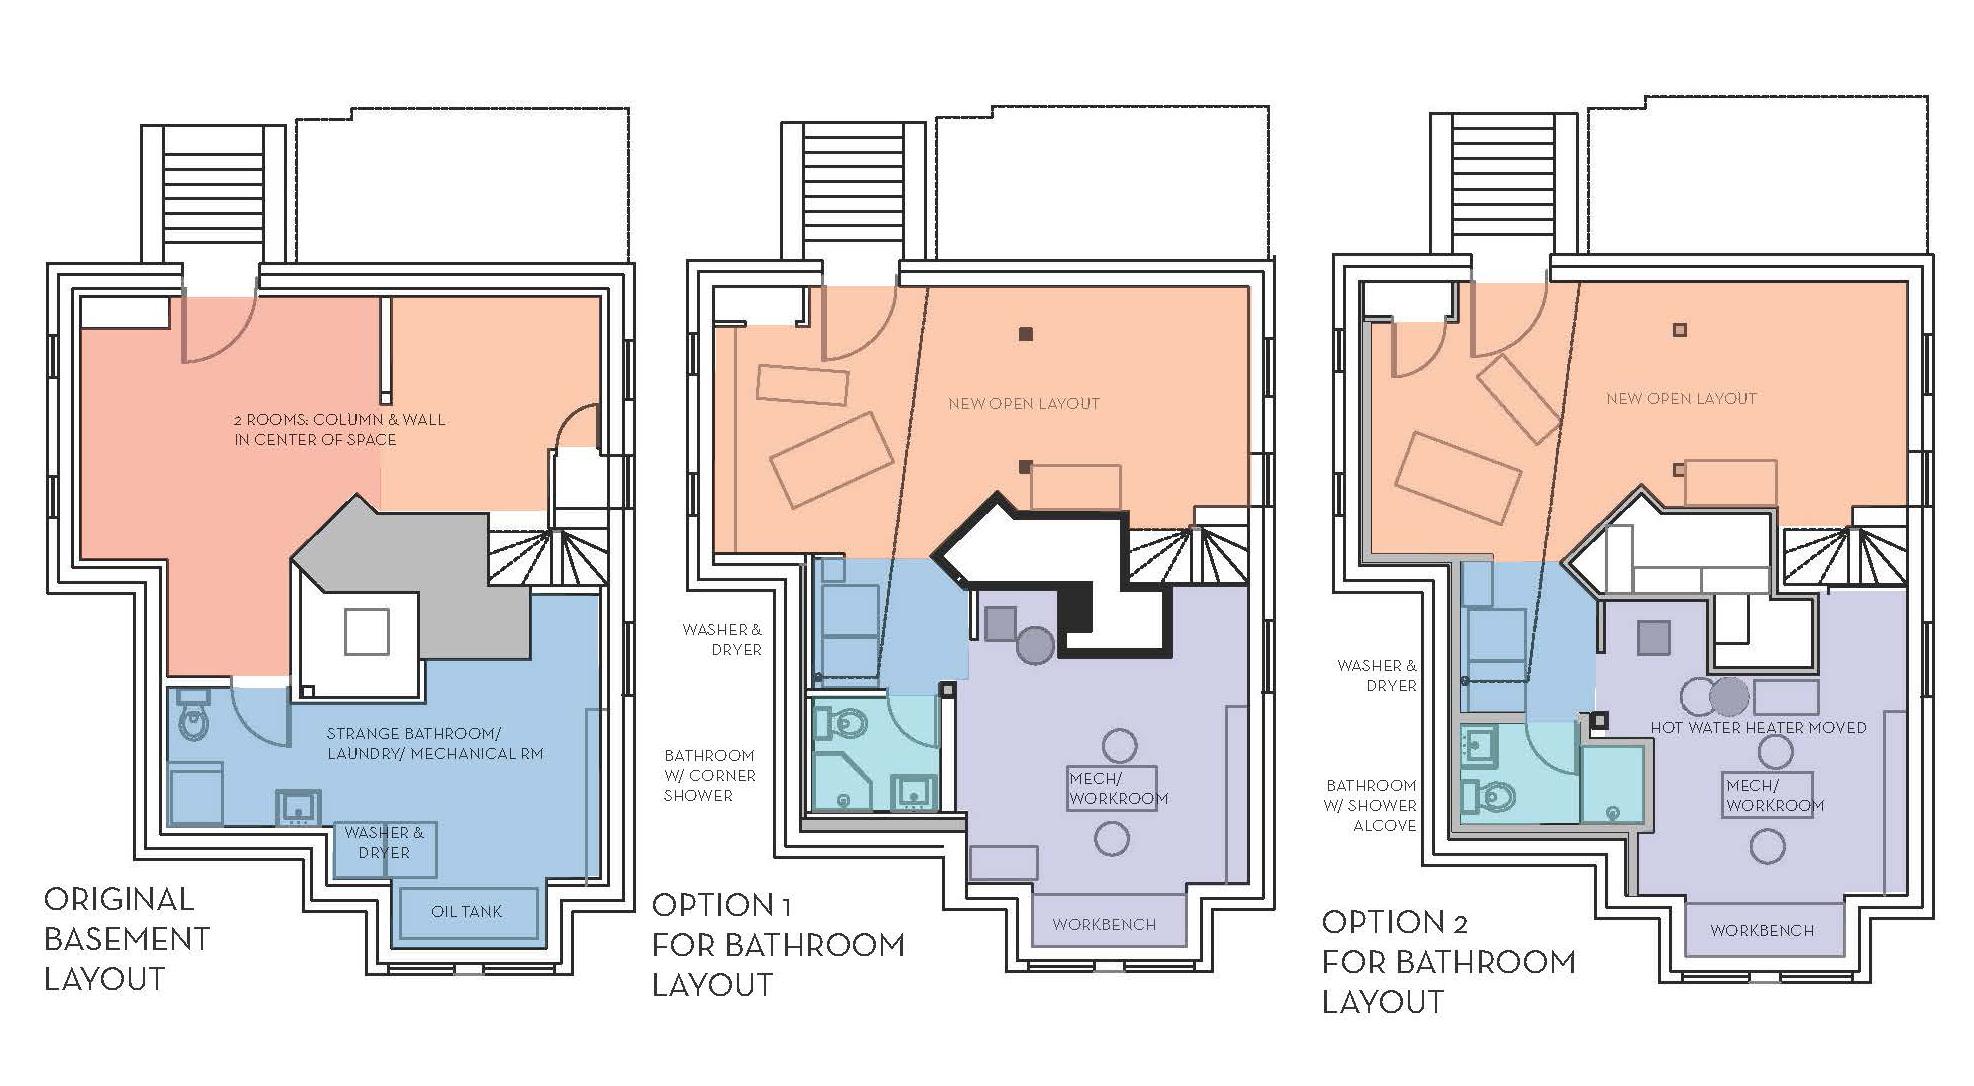 Basement design layouts 7 architecture - 7 great basement design ideas ...